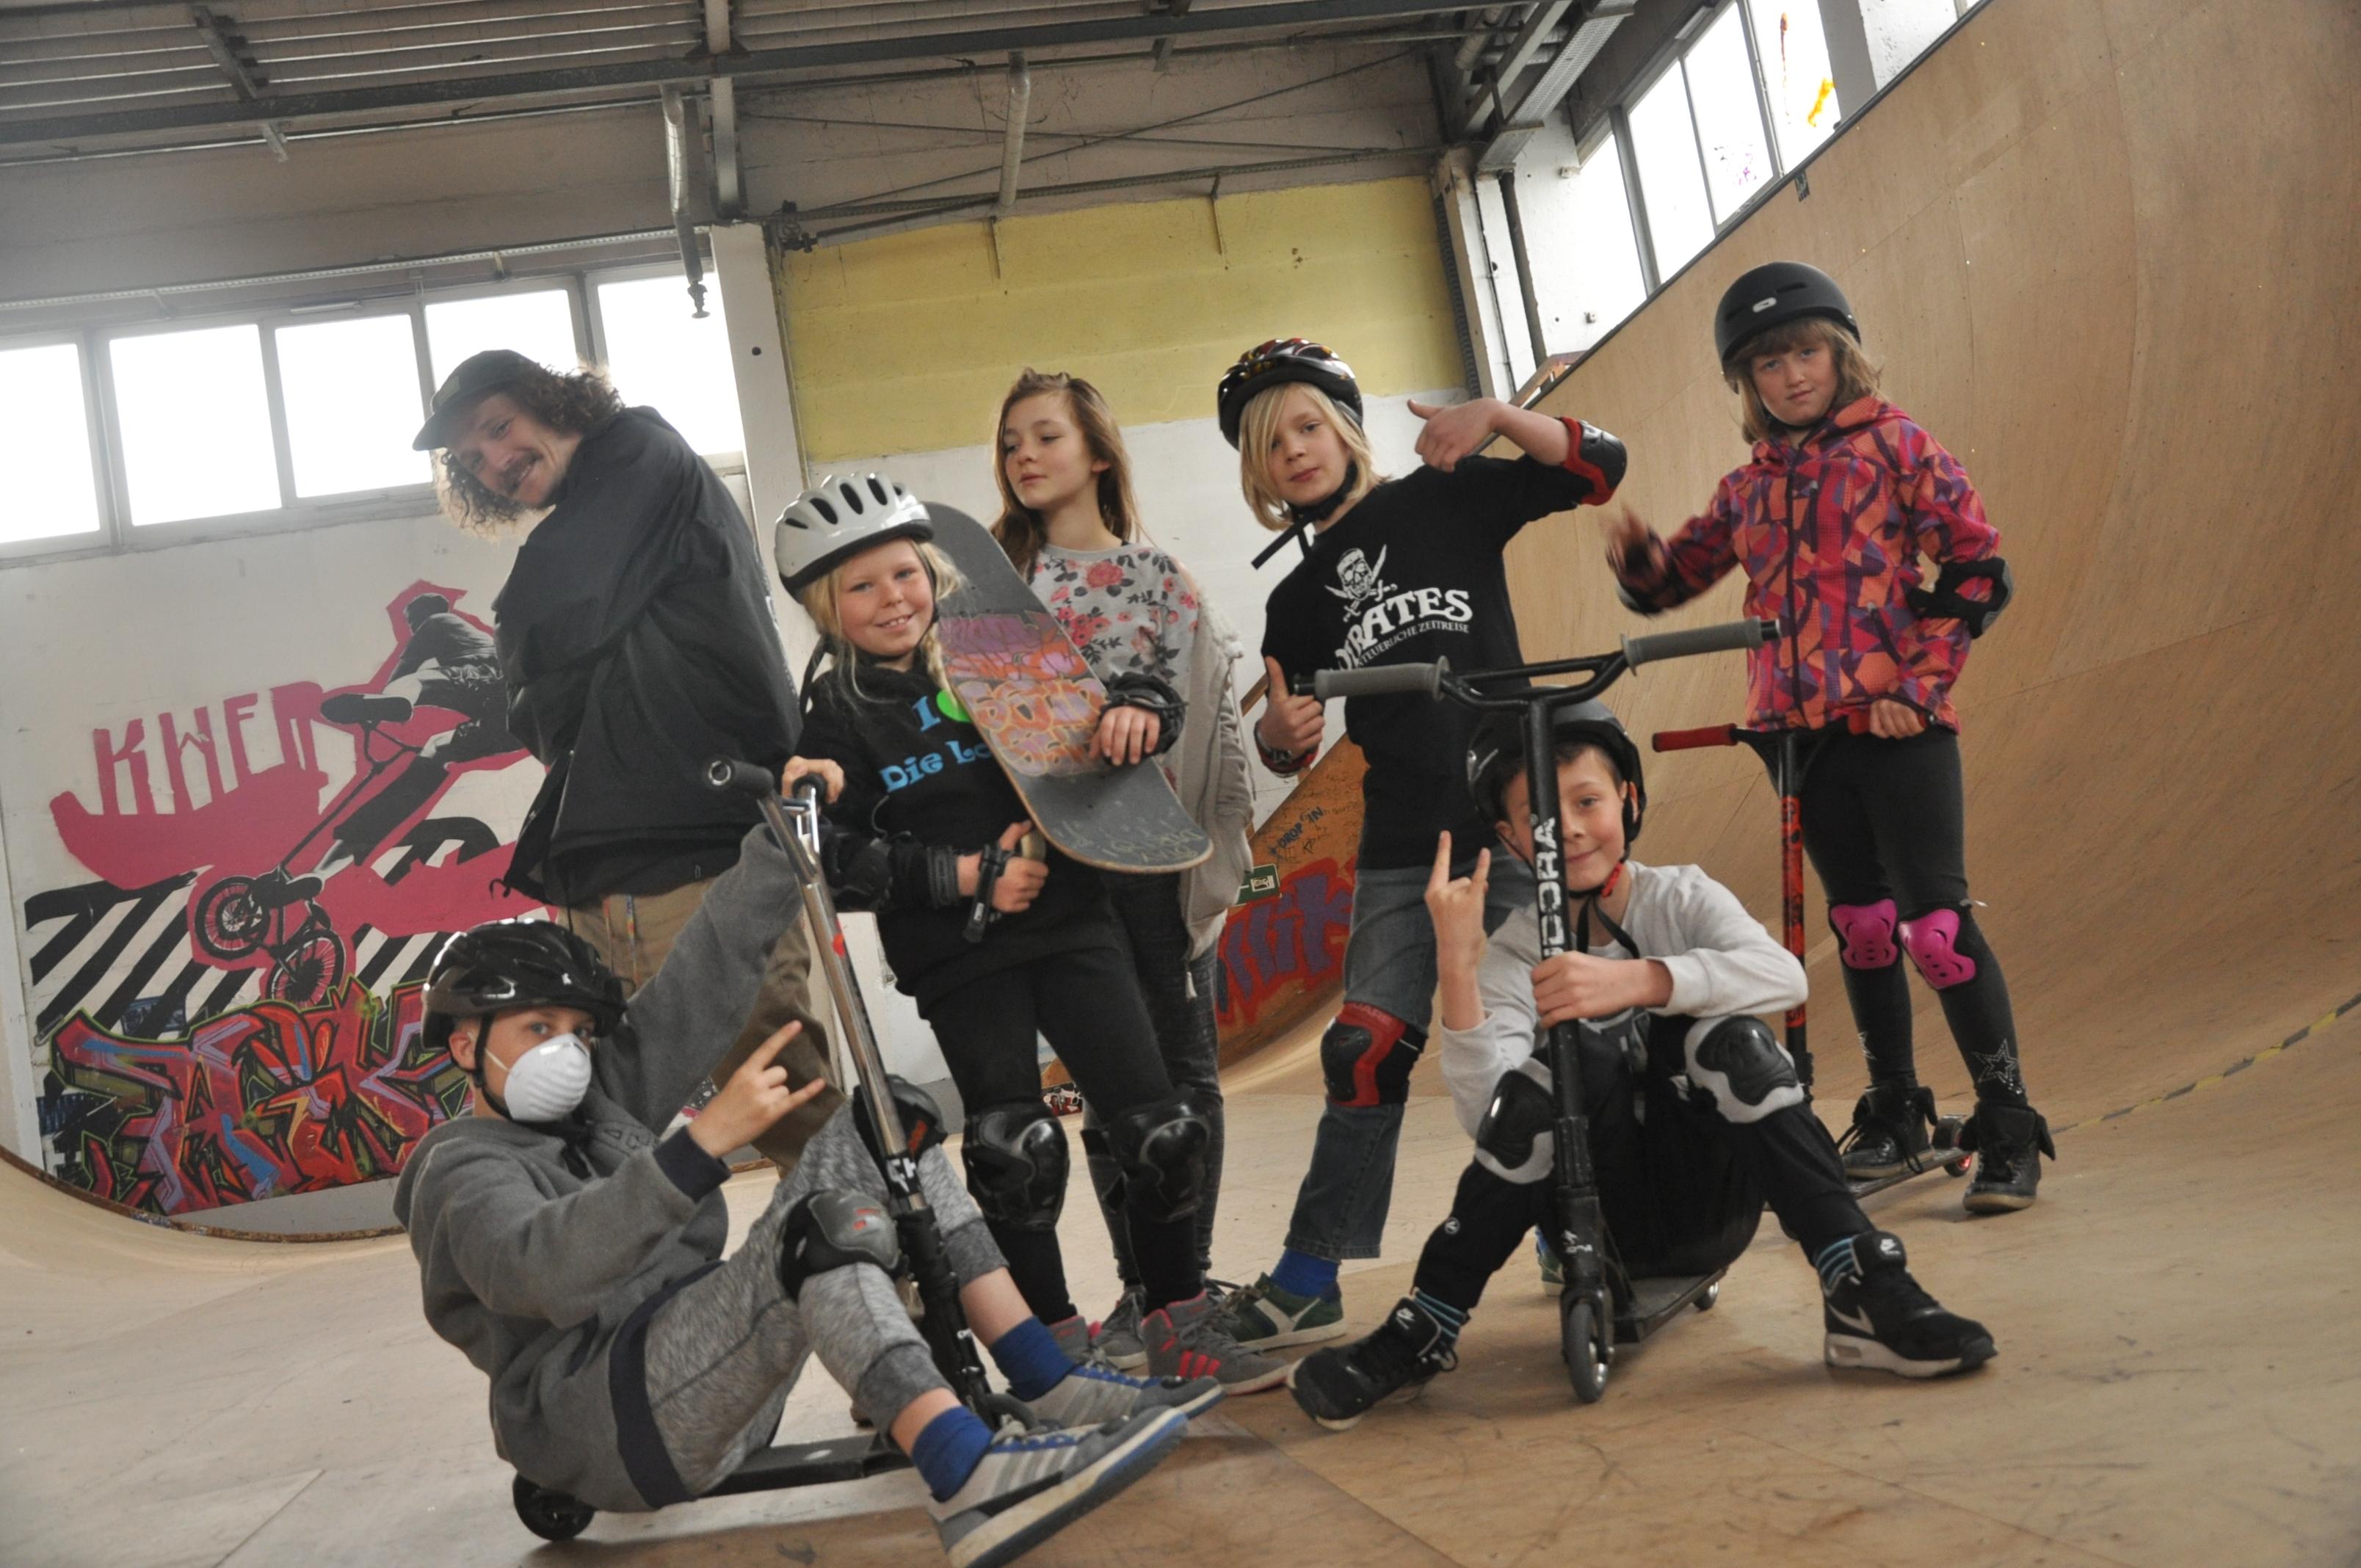 Skate-Crew